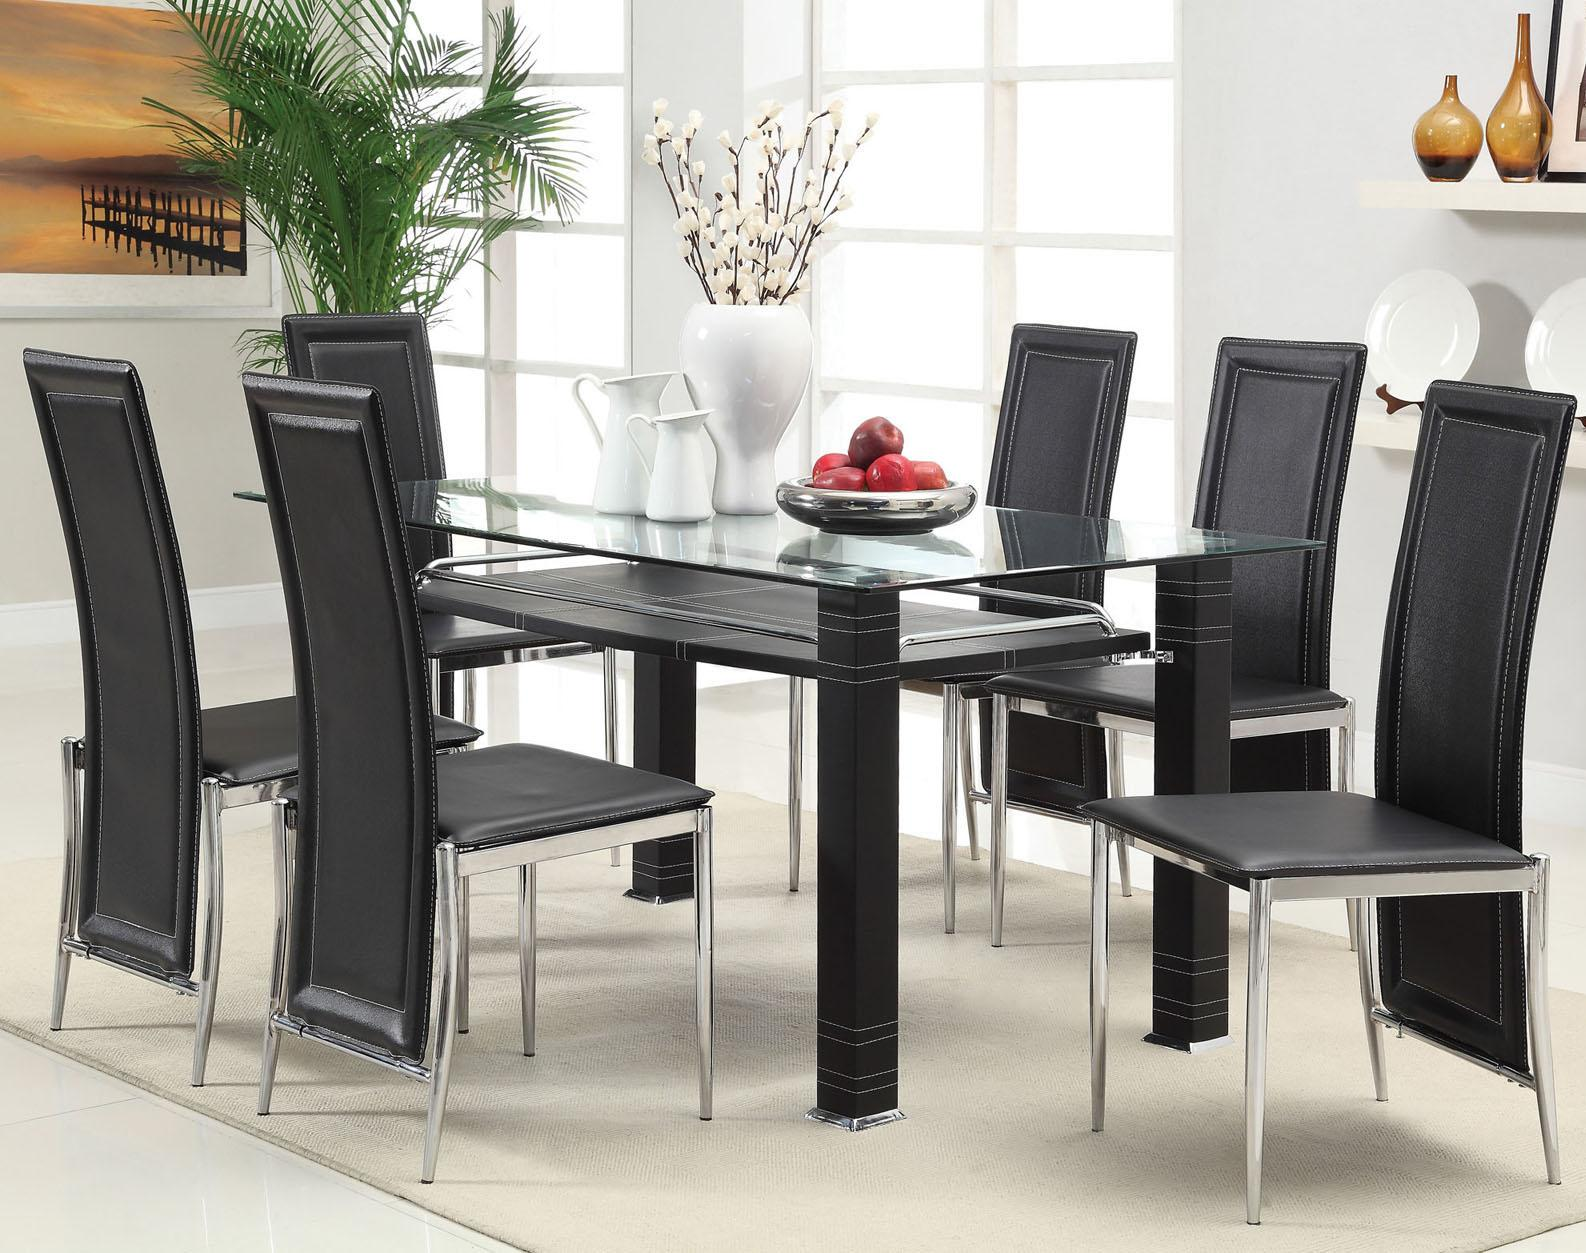 Riggan Black Leg Table with Black Vinyl Chairs Set by Acme Furniture at A1 Furniture & Mattress